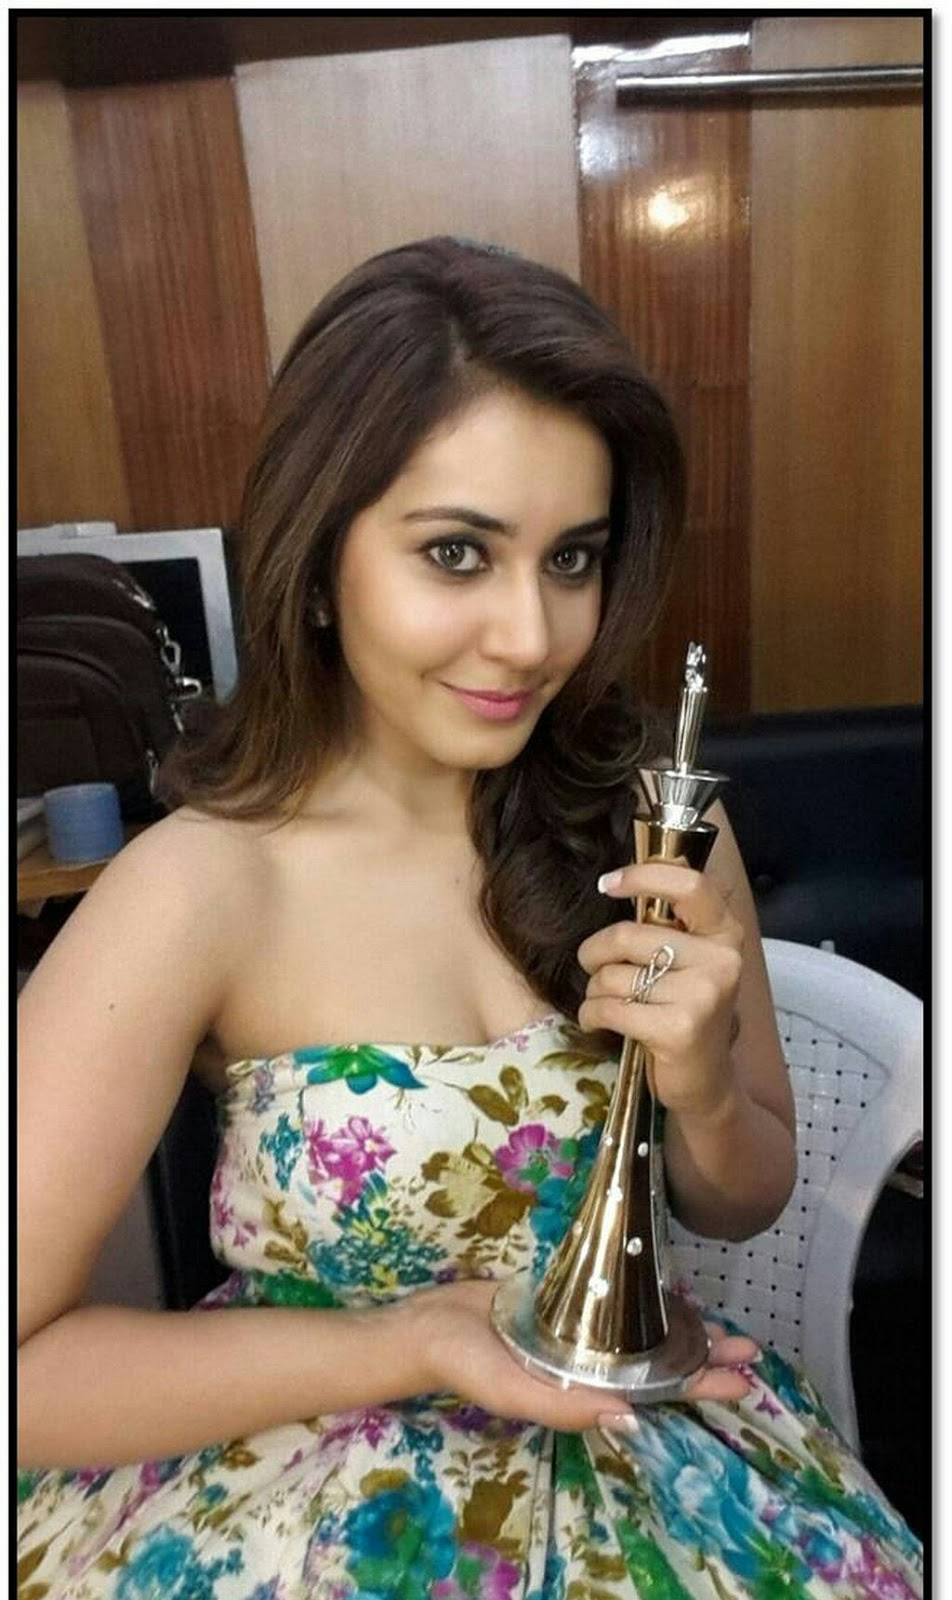 Rashi Khanna Latest Hot Photos 5 1 - Rashi Khanna Sexiest Cleavage Pictures Collection-Hot HD Photos